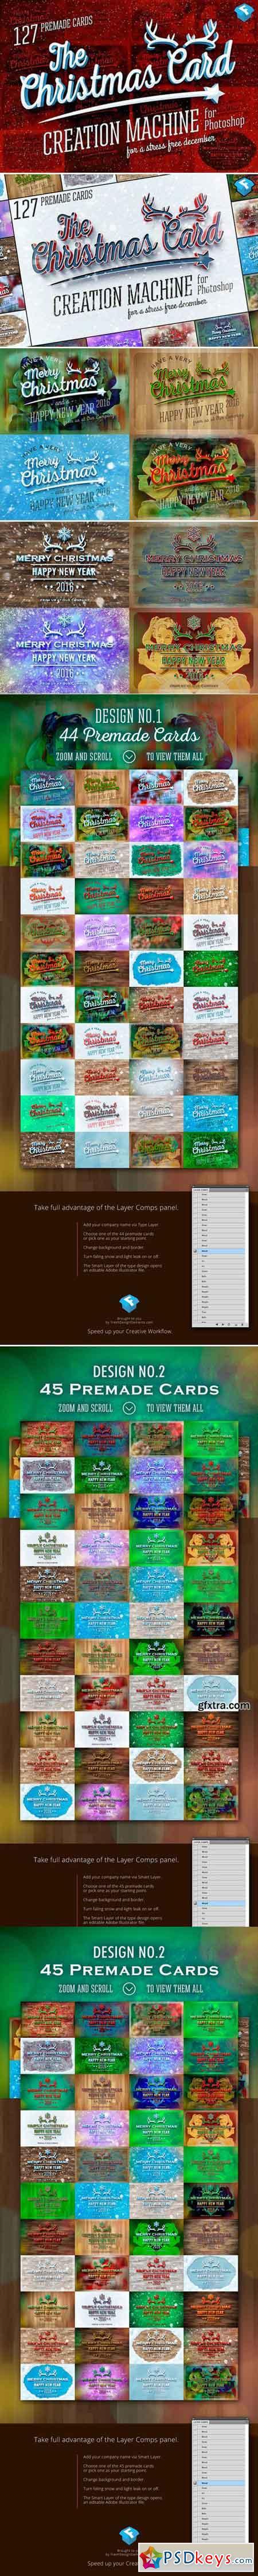 Christmas Card Creation Machine 419261